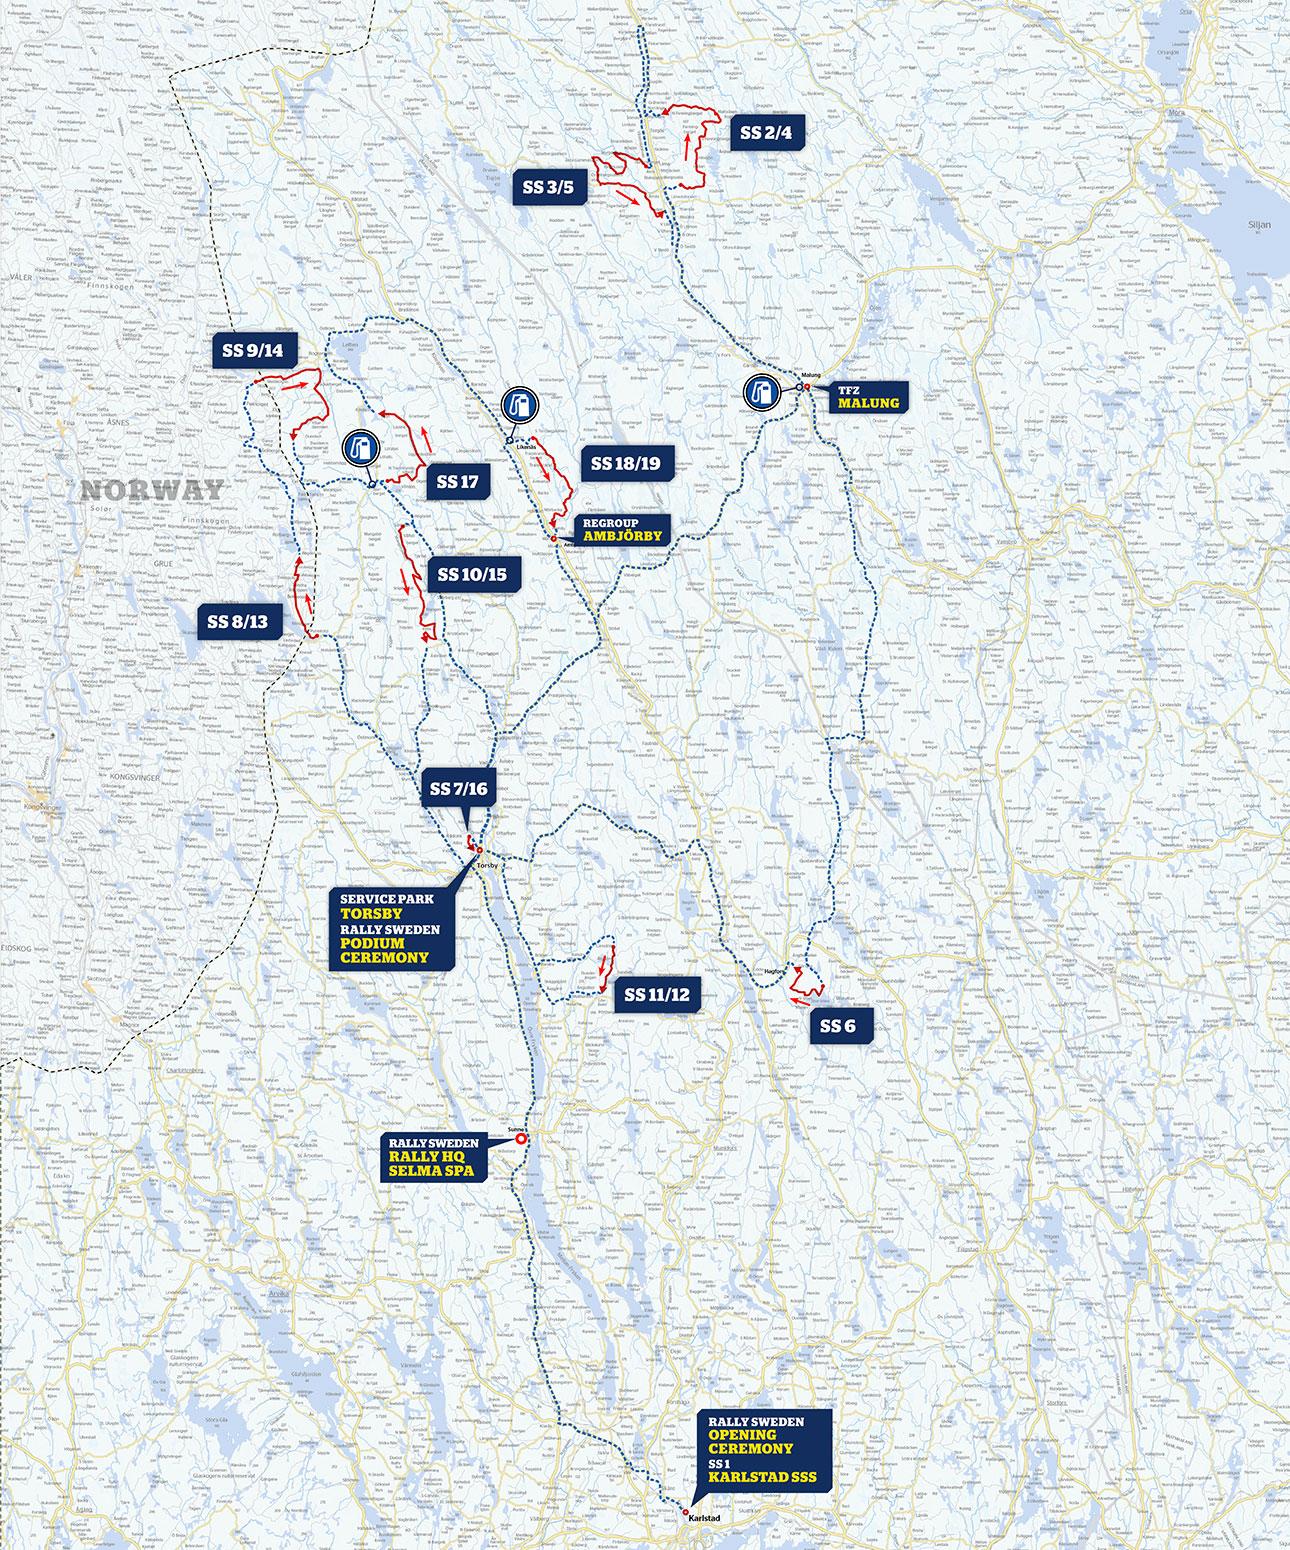 World Rally Championship: Temporada 2020 - Página 40 Rs21_map_draft_v2_webb_overall